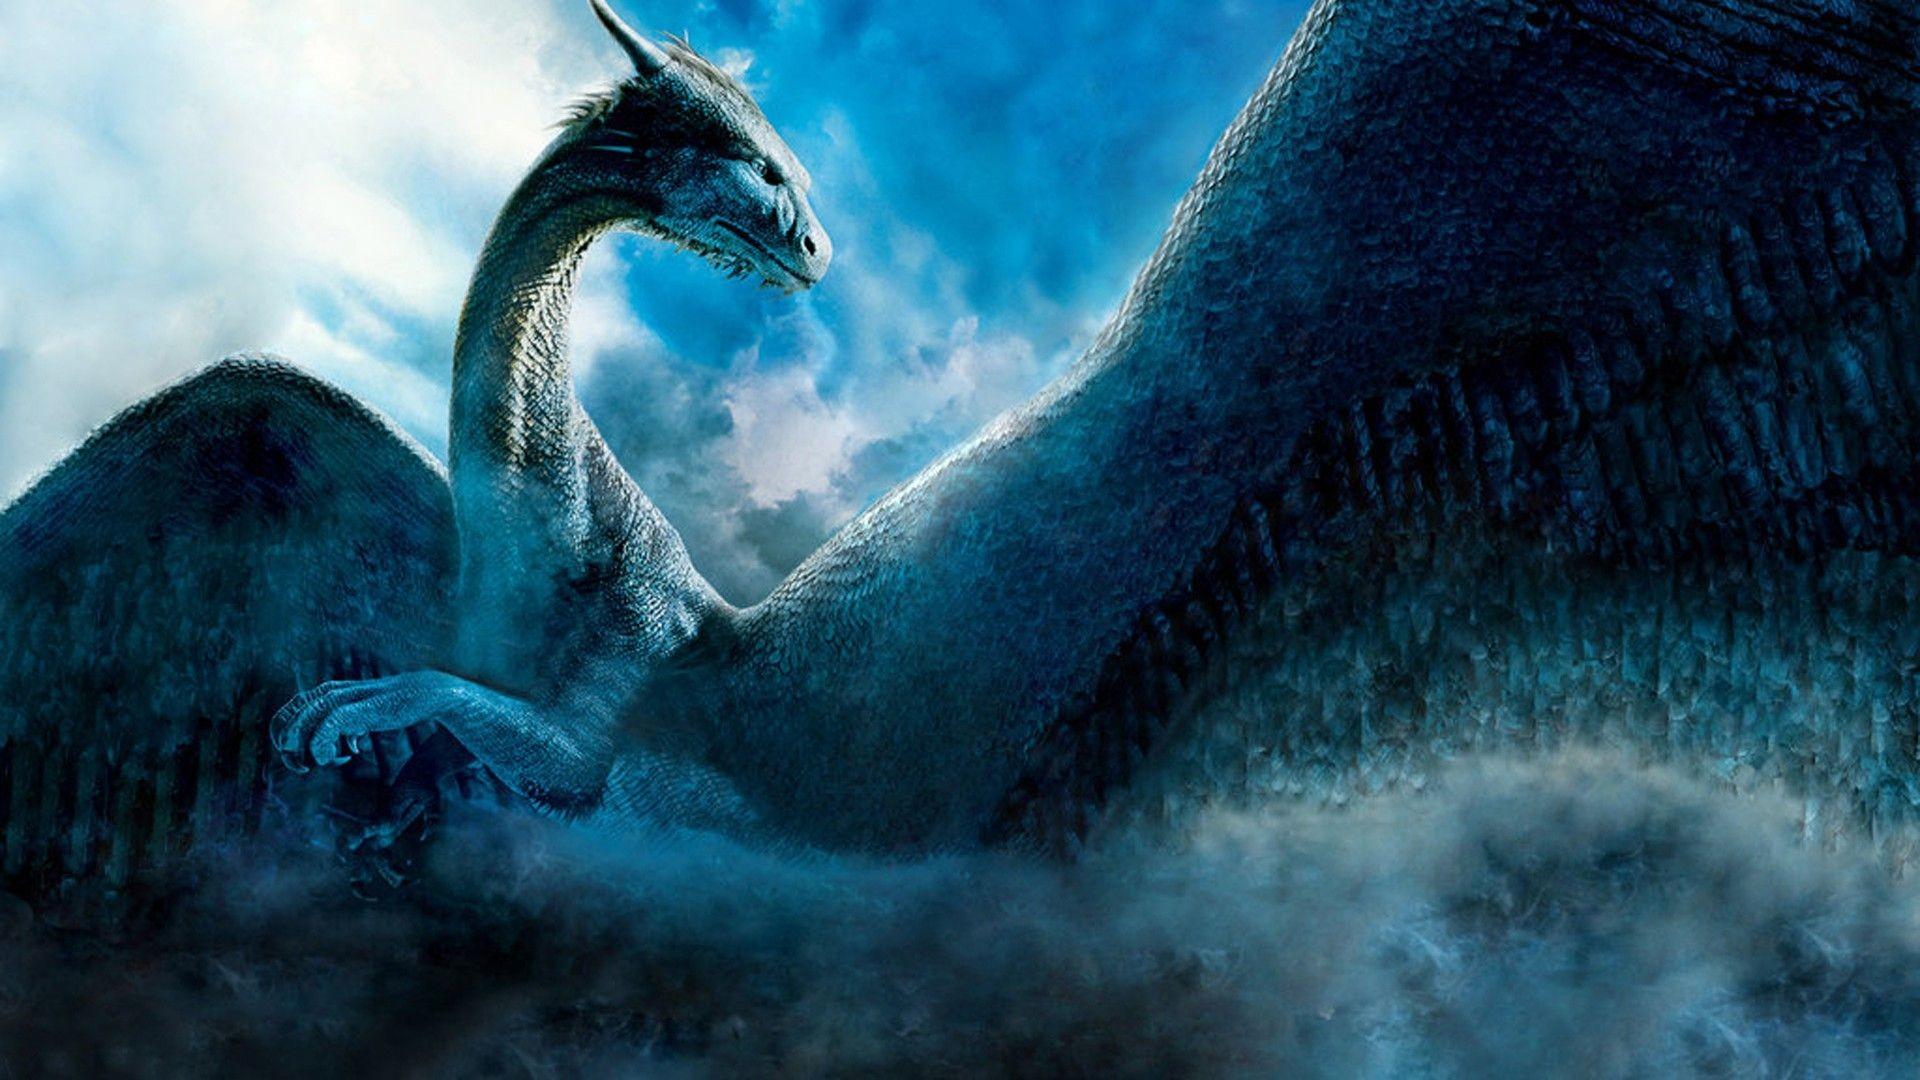 Dragon Wallpaper HD 1080p 76 images